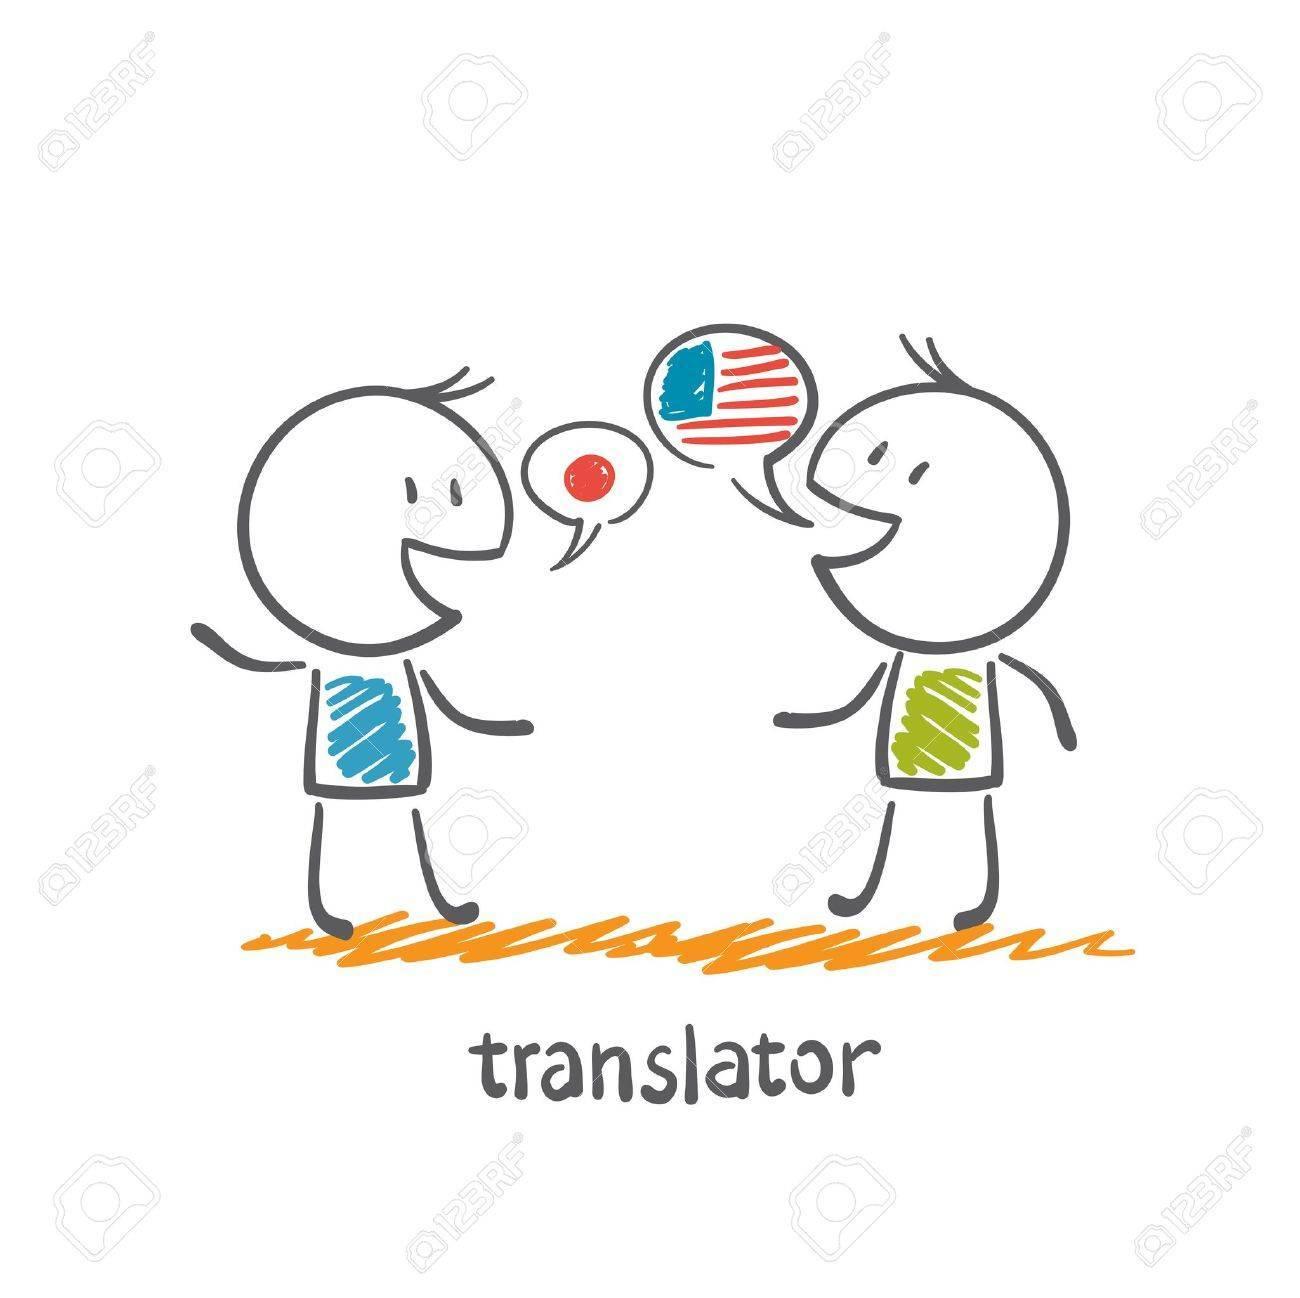 Tranlator clipart black and white Translator clipart 7 » Clipart Portal black and white